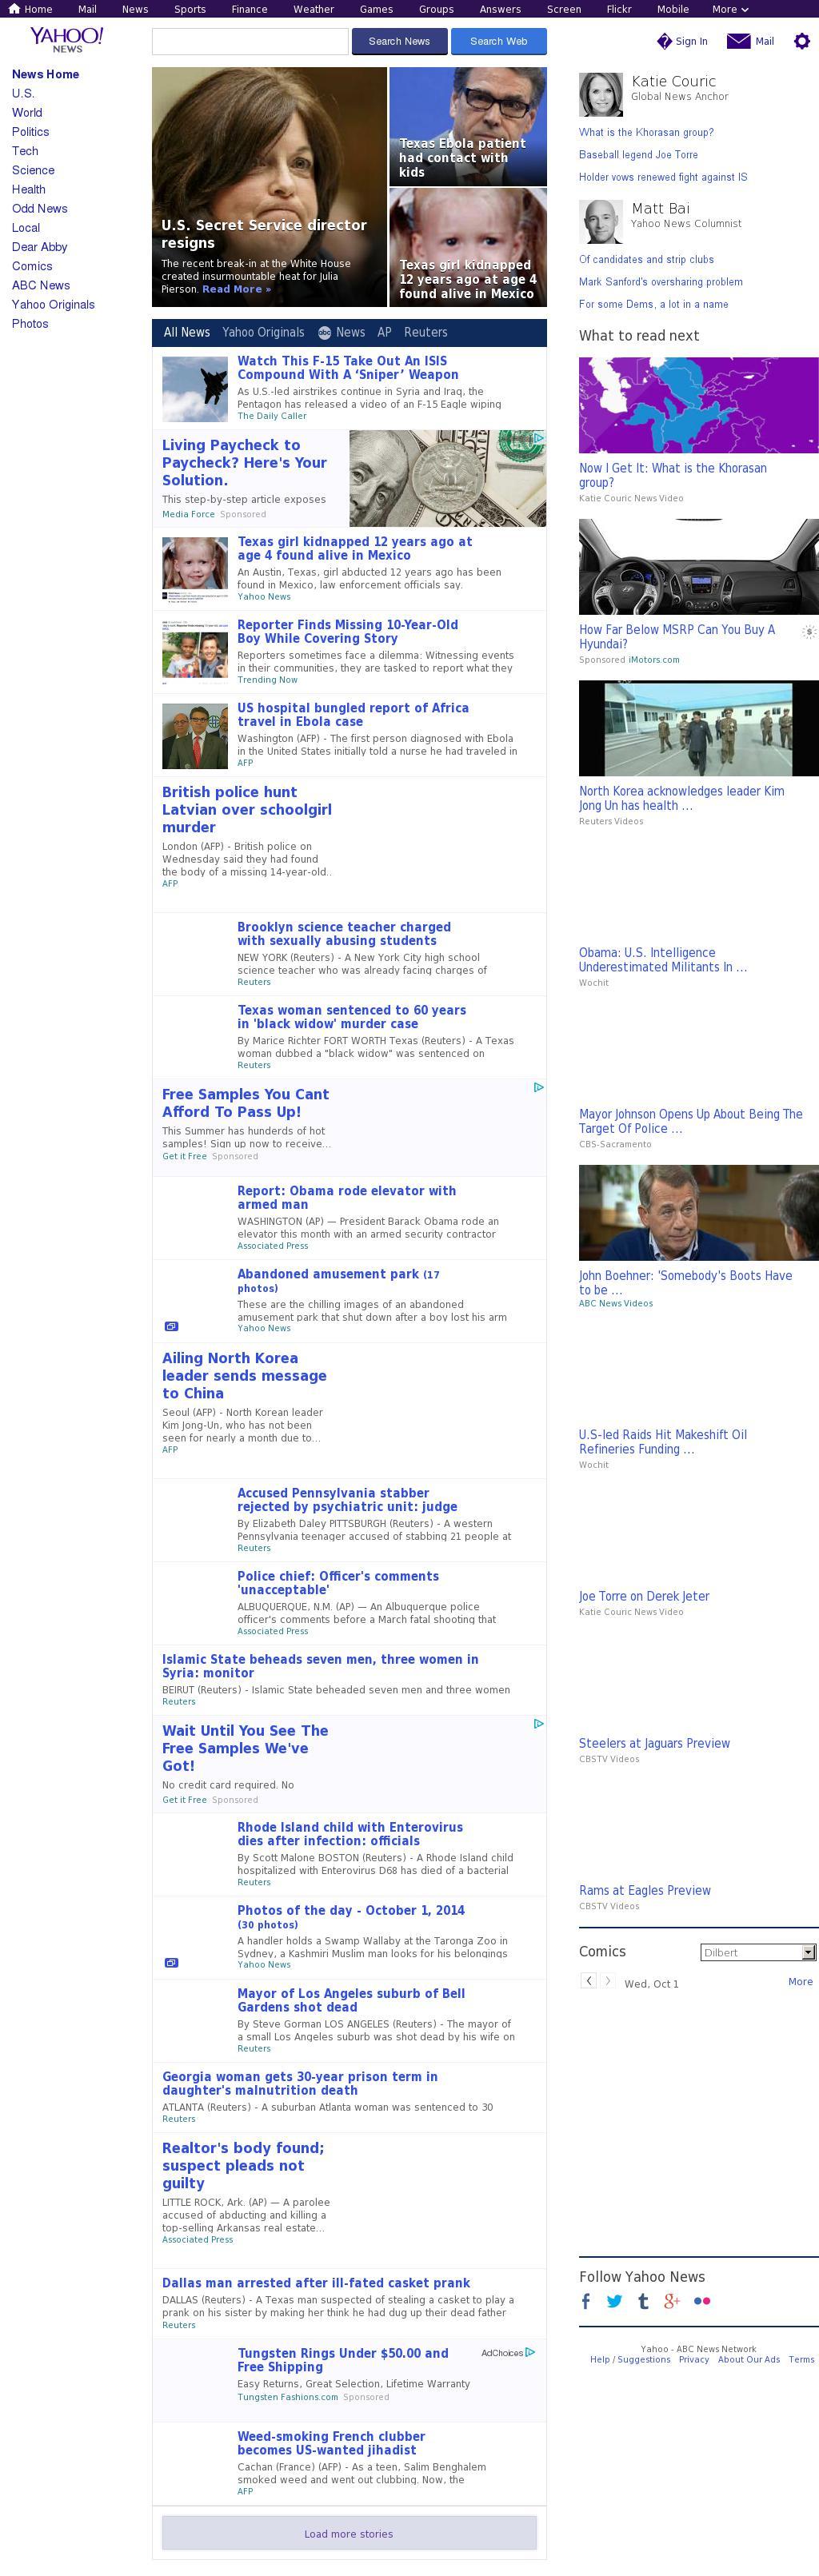 Yahoo! News at Wednesday Oct. 1, 2014, 8:22 p.m. UTC